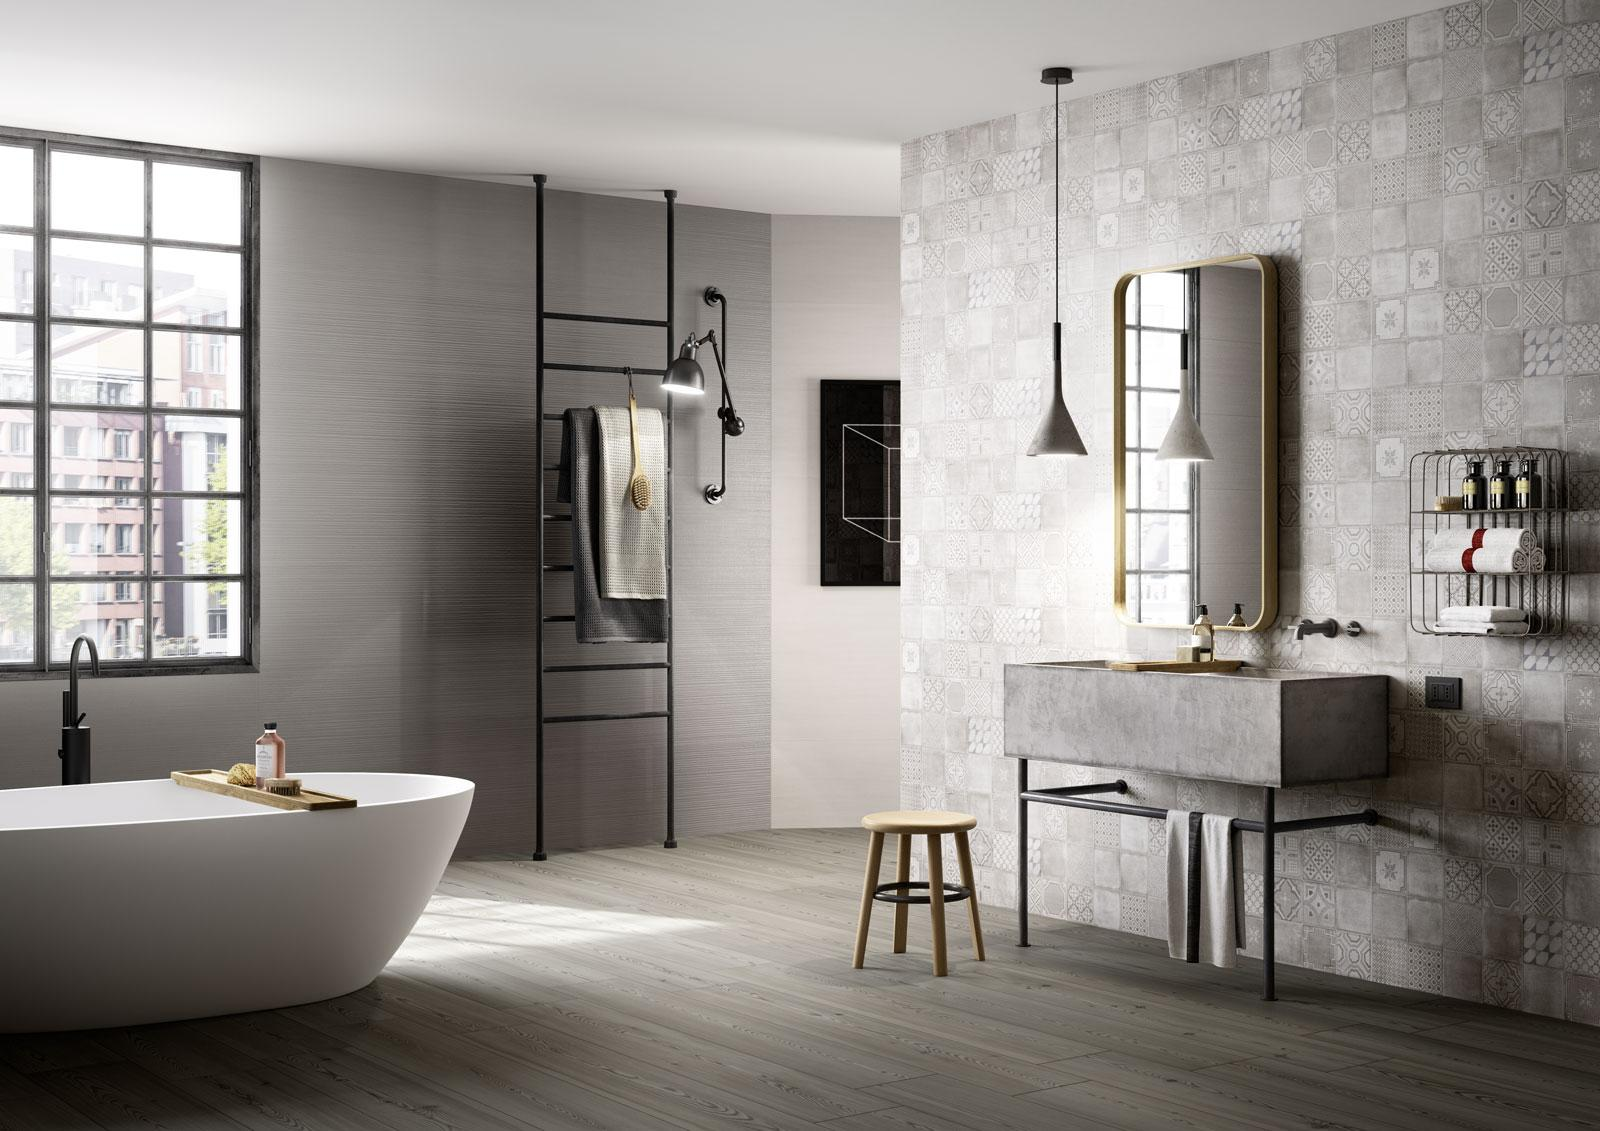 Salle De Bain Industrielle aménagement inspirant : la salle de bain industrielle